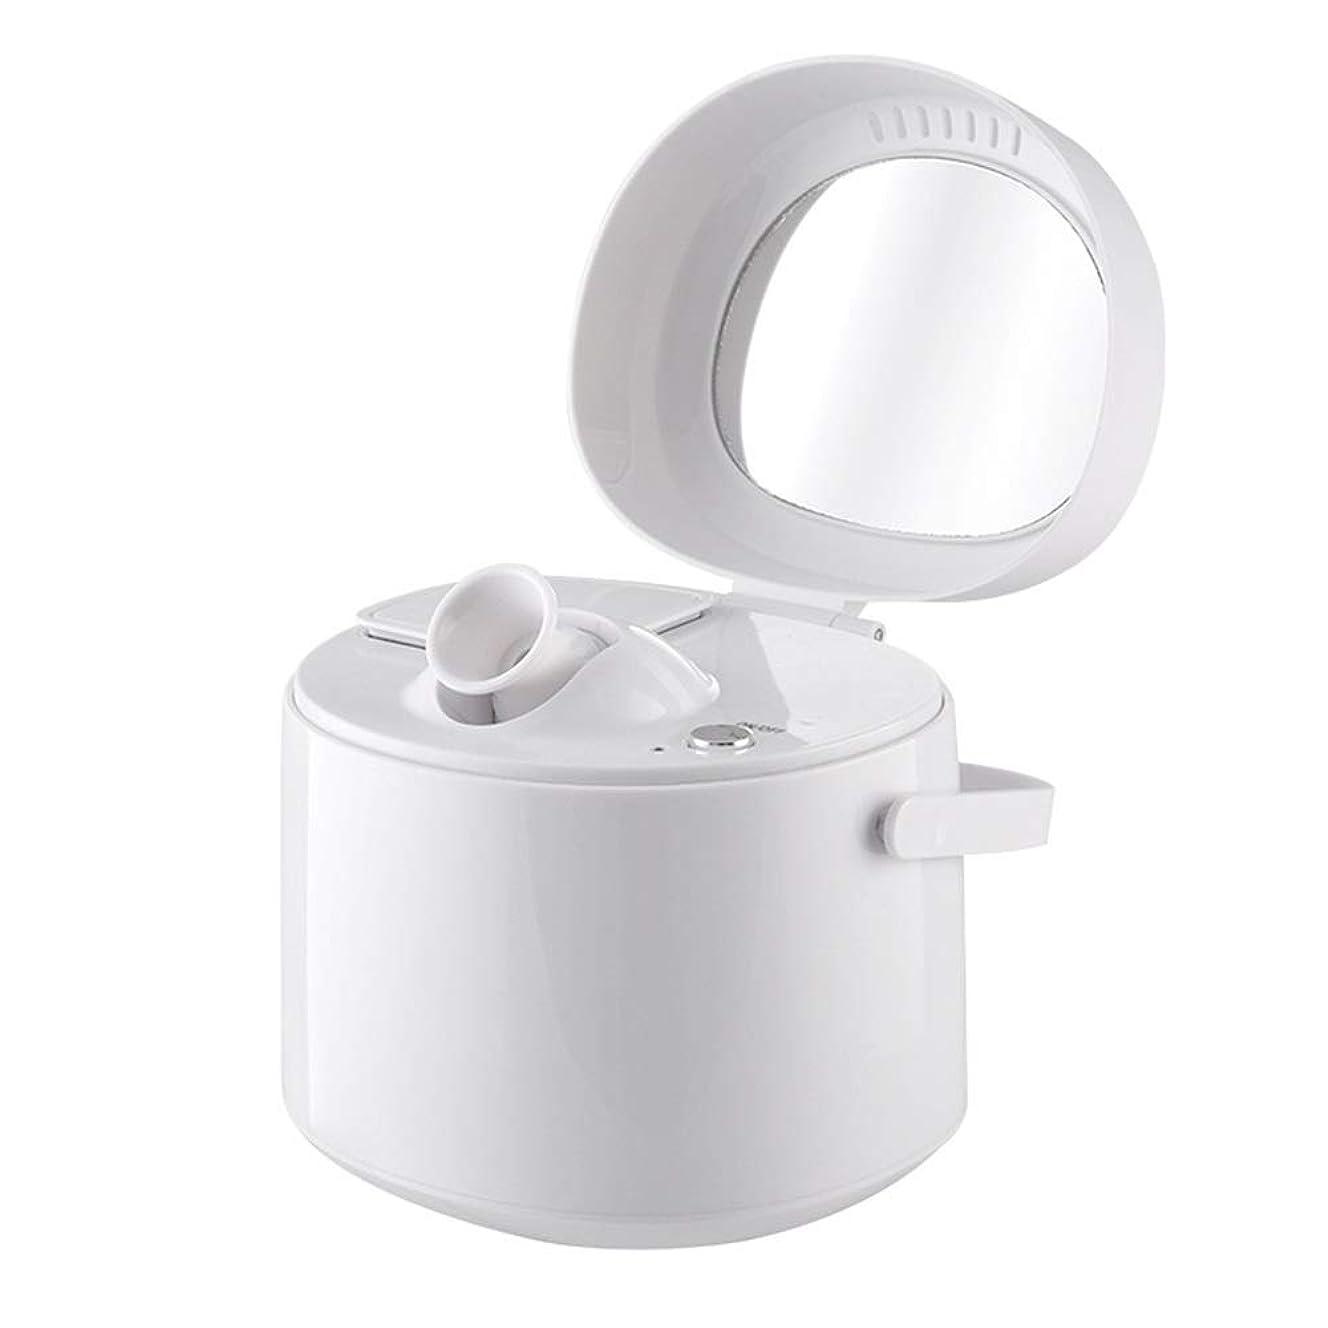 ZXF ホットスプレースチームフェイス美容器具ホームナノイオン保湿スプレー美容器具美容ミラーホワイト 滑らかである